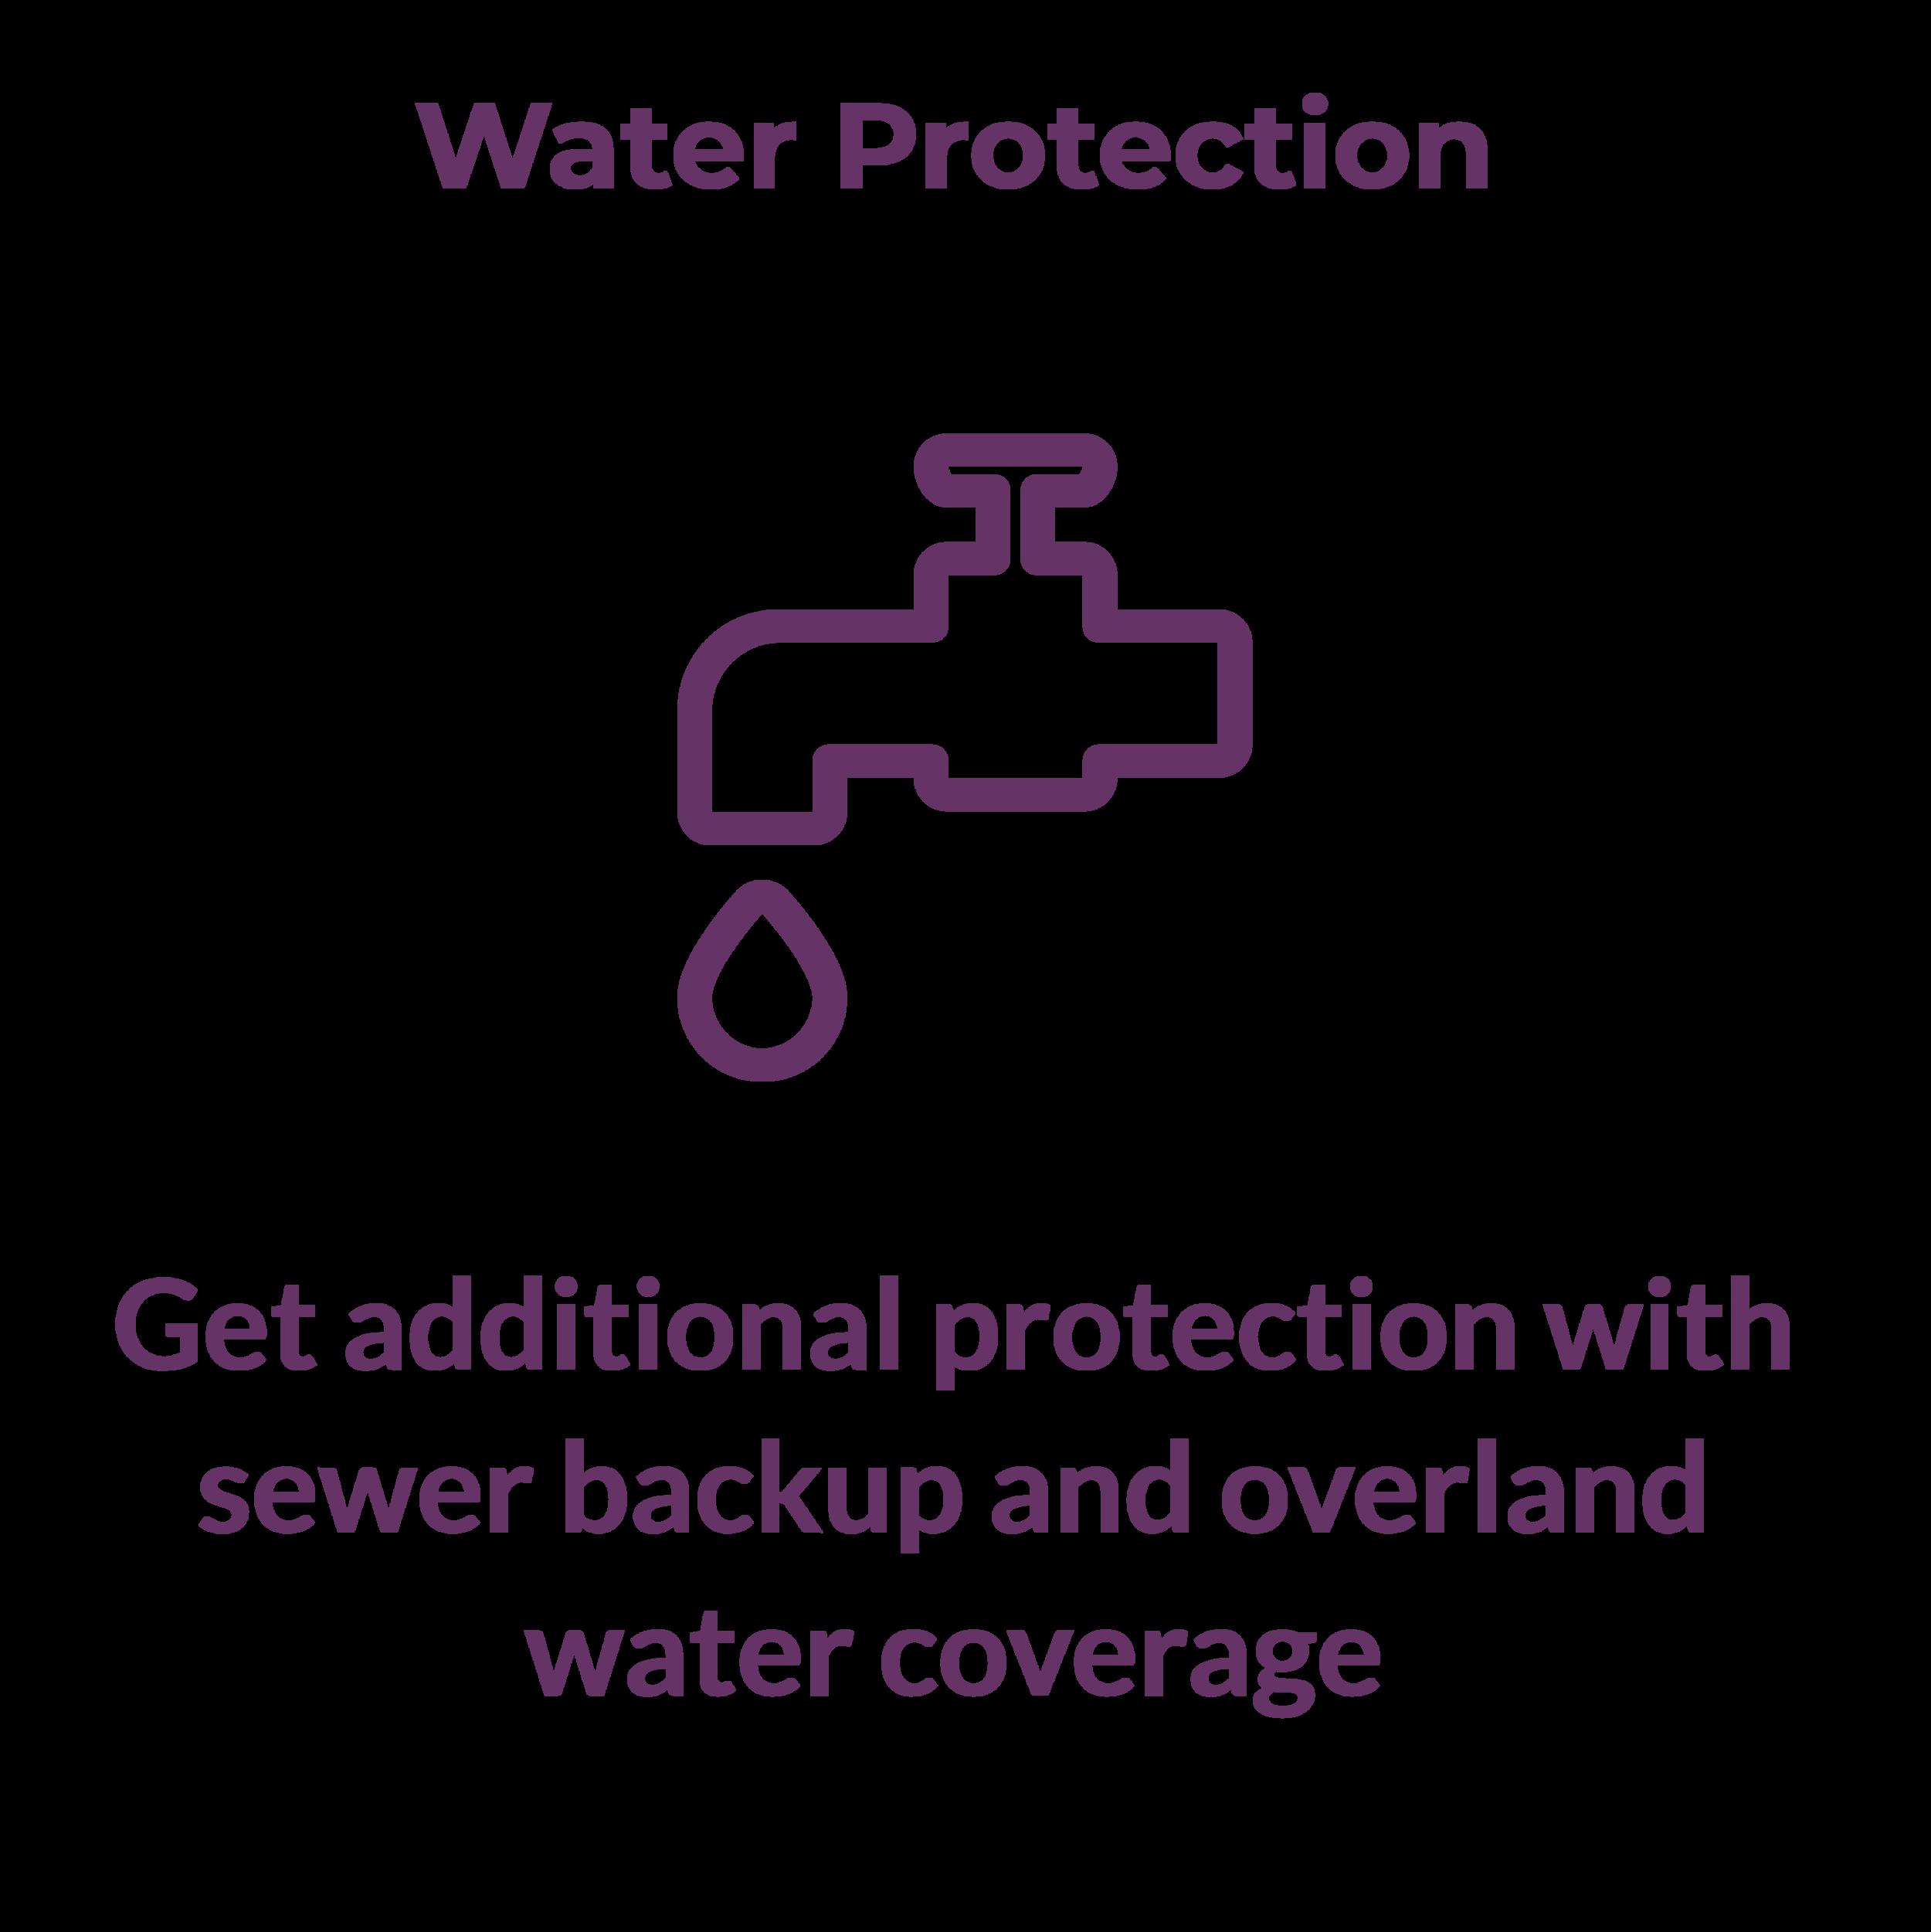 waterprotection-01.png